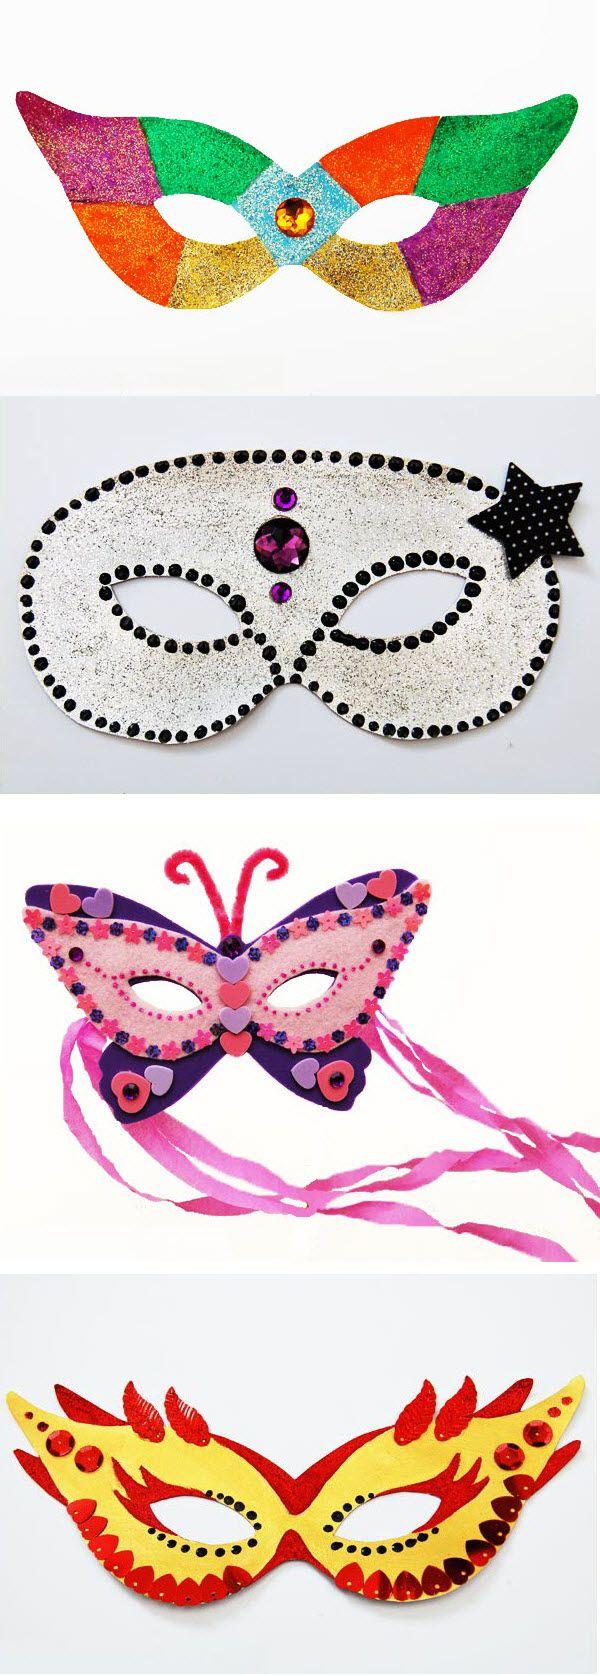 Masques carnaval faire soi meme patron a imprimer free imprintable bricos pinterest - Masque de carnaval a imprimer ...